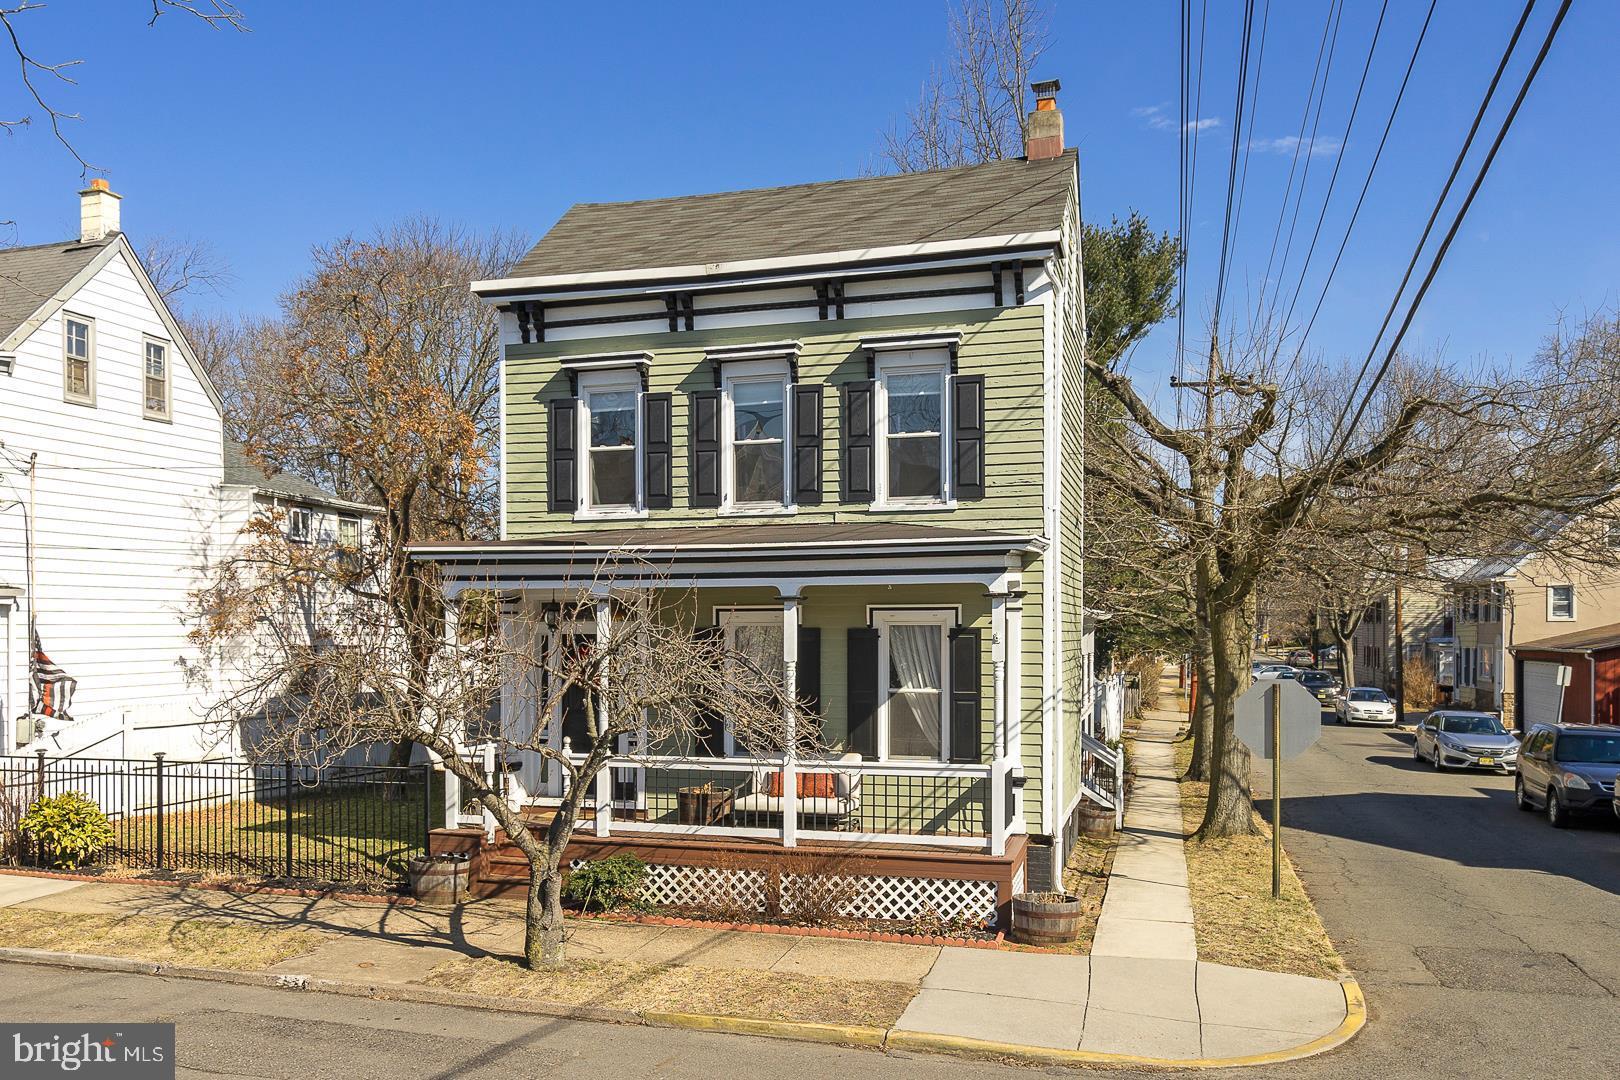 433 PRINCE ST, BORDENTOWN, NJ 08505